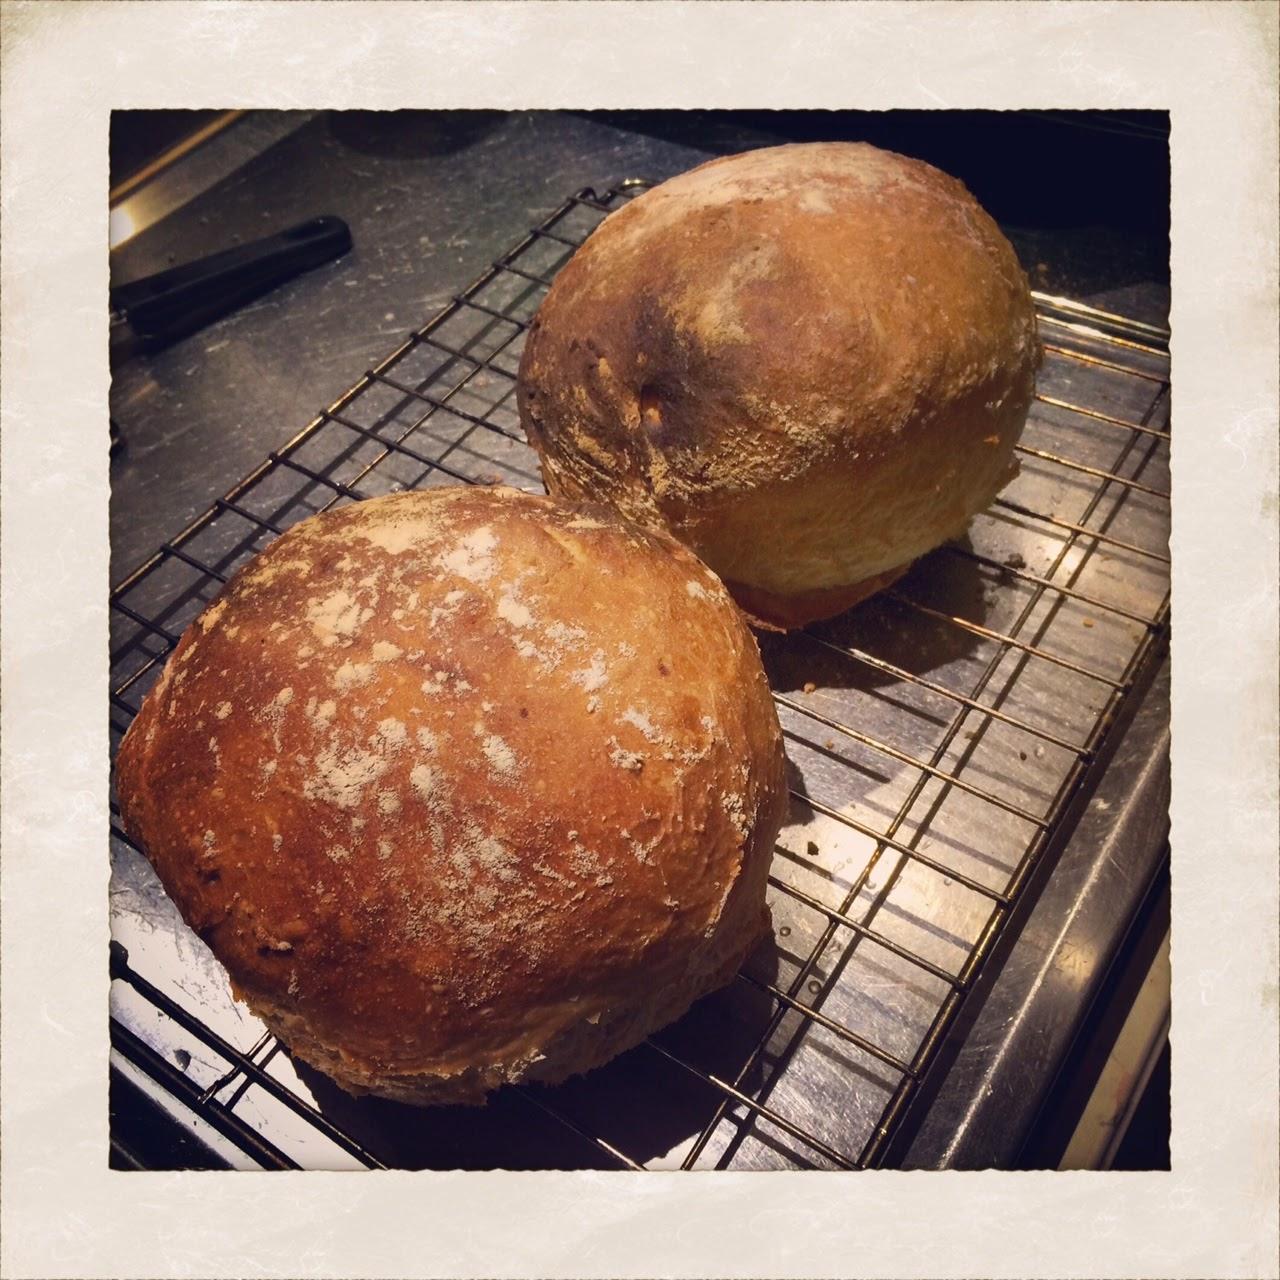 Martin johansson bröd